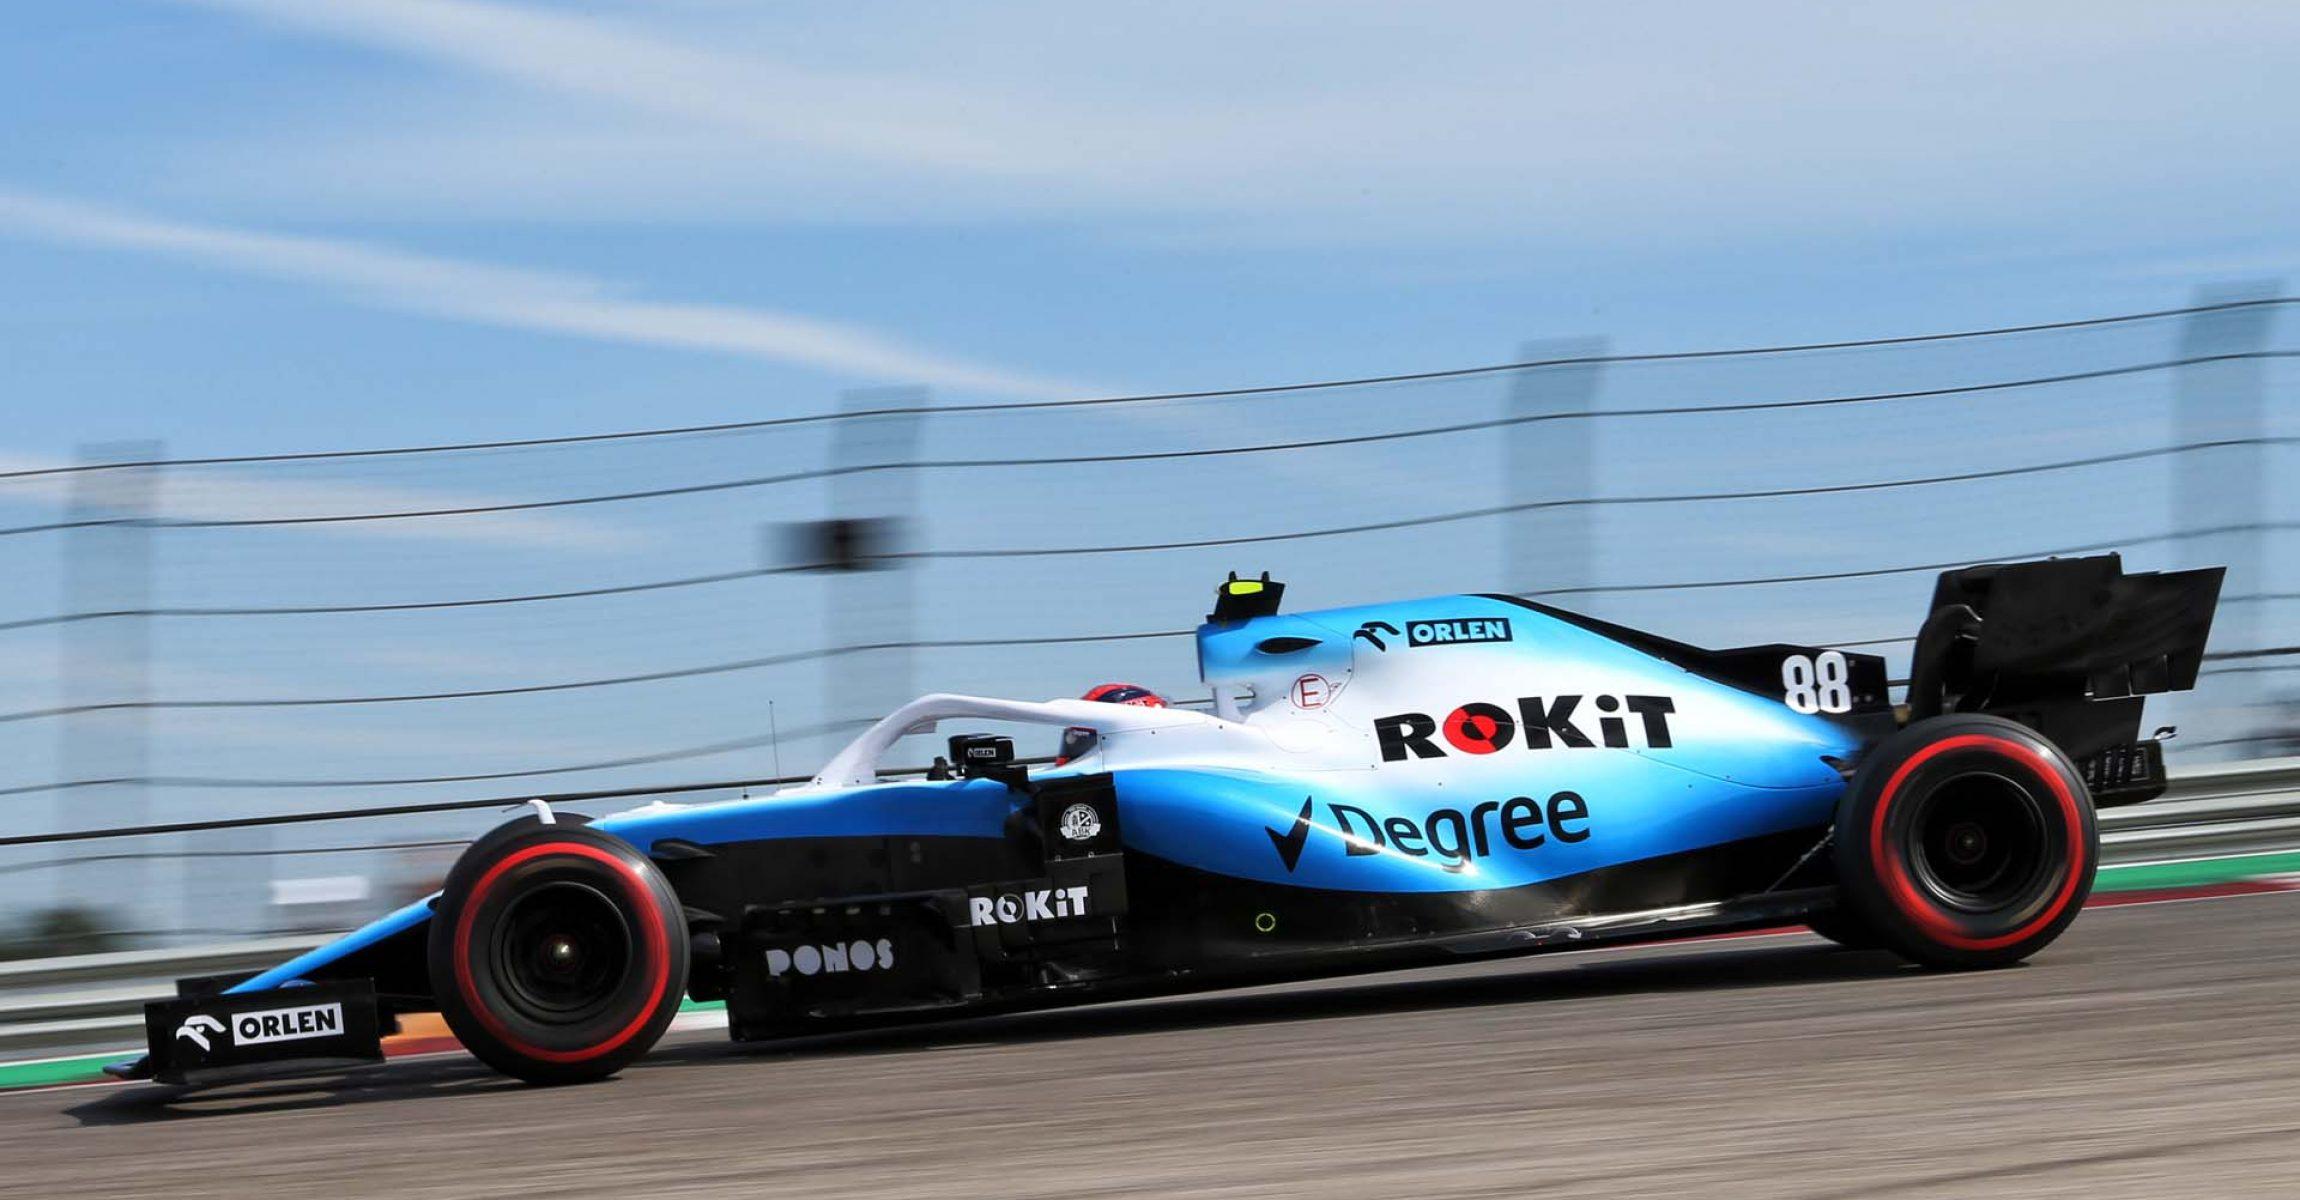 Robert Kubica (POL) Williams Racing FW42. United States Grand Prix, Saturday 2nd November 2019. Circuit of the Americas, Austin, Texas, USA.